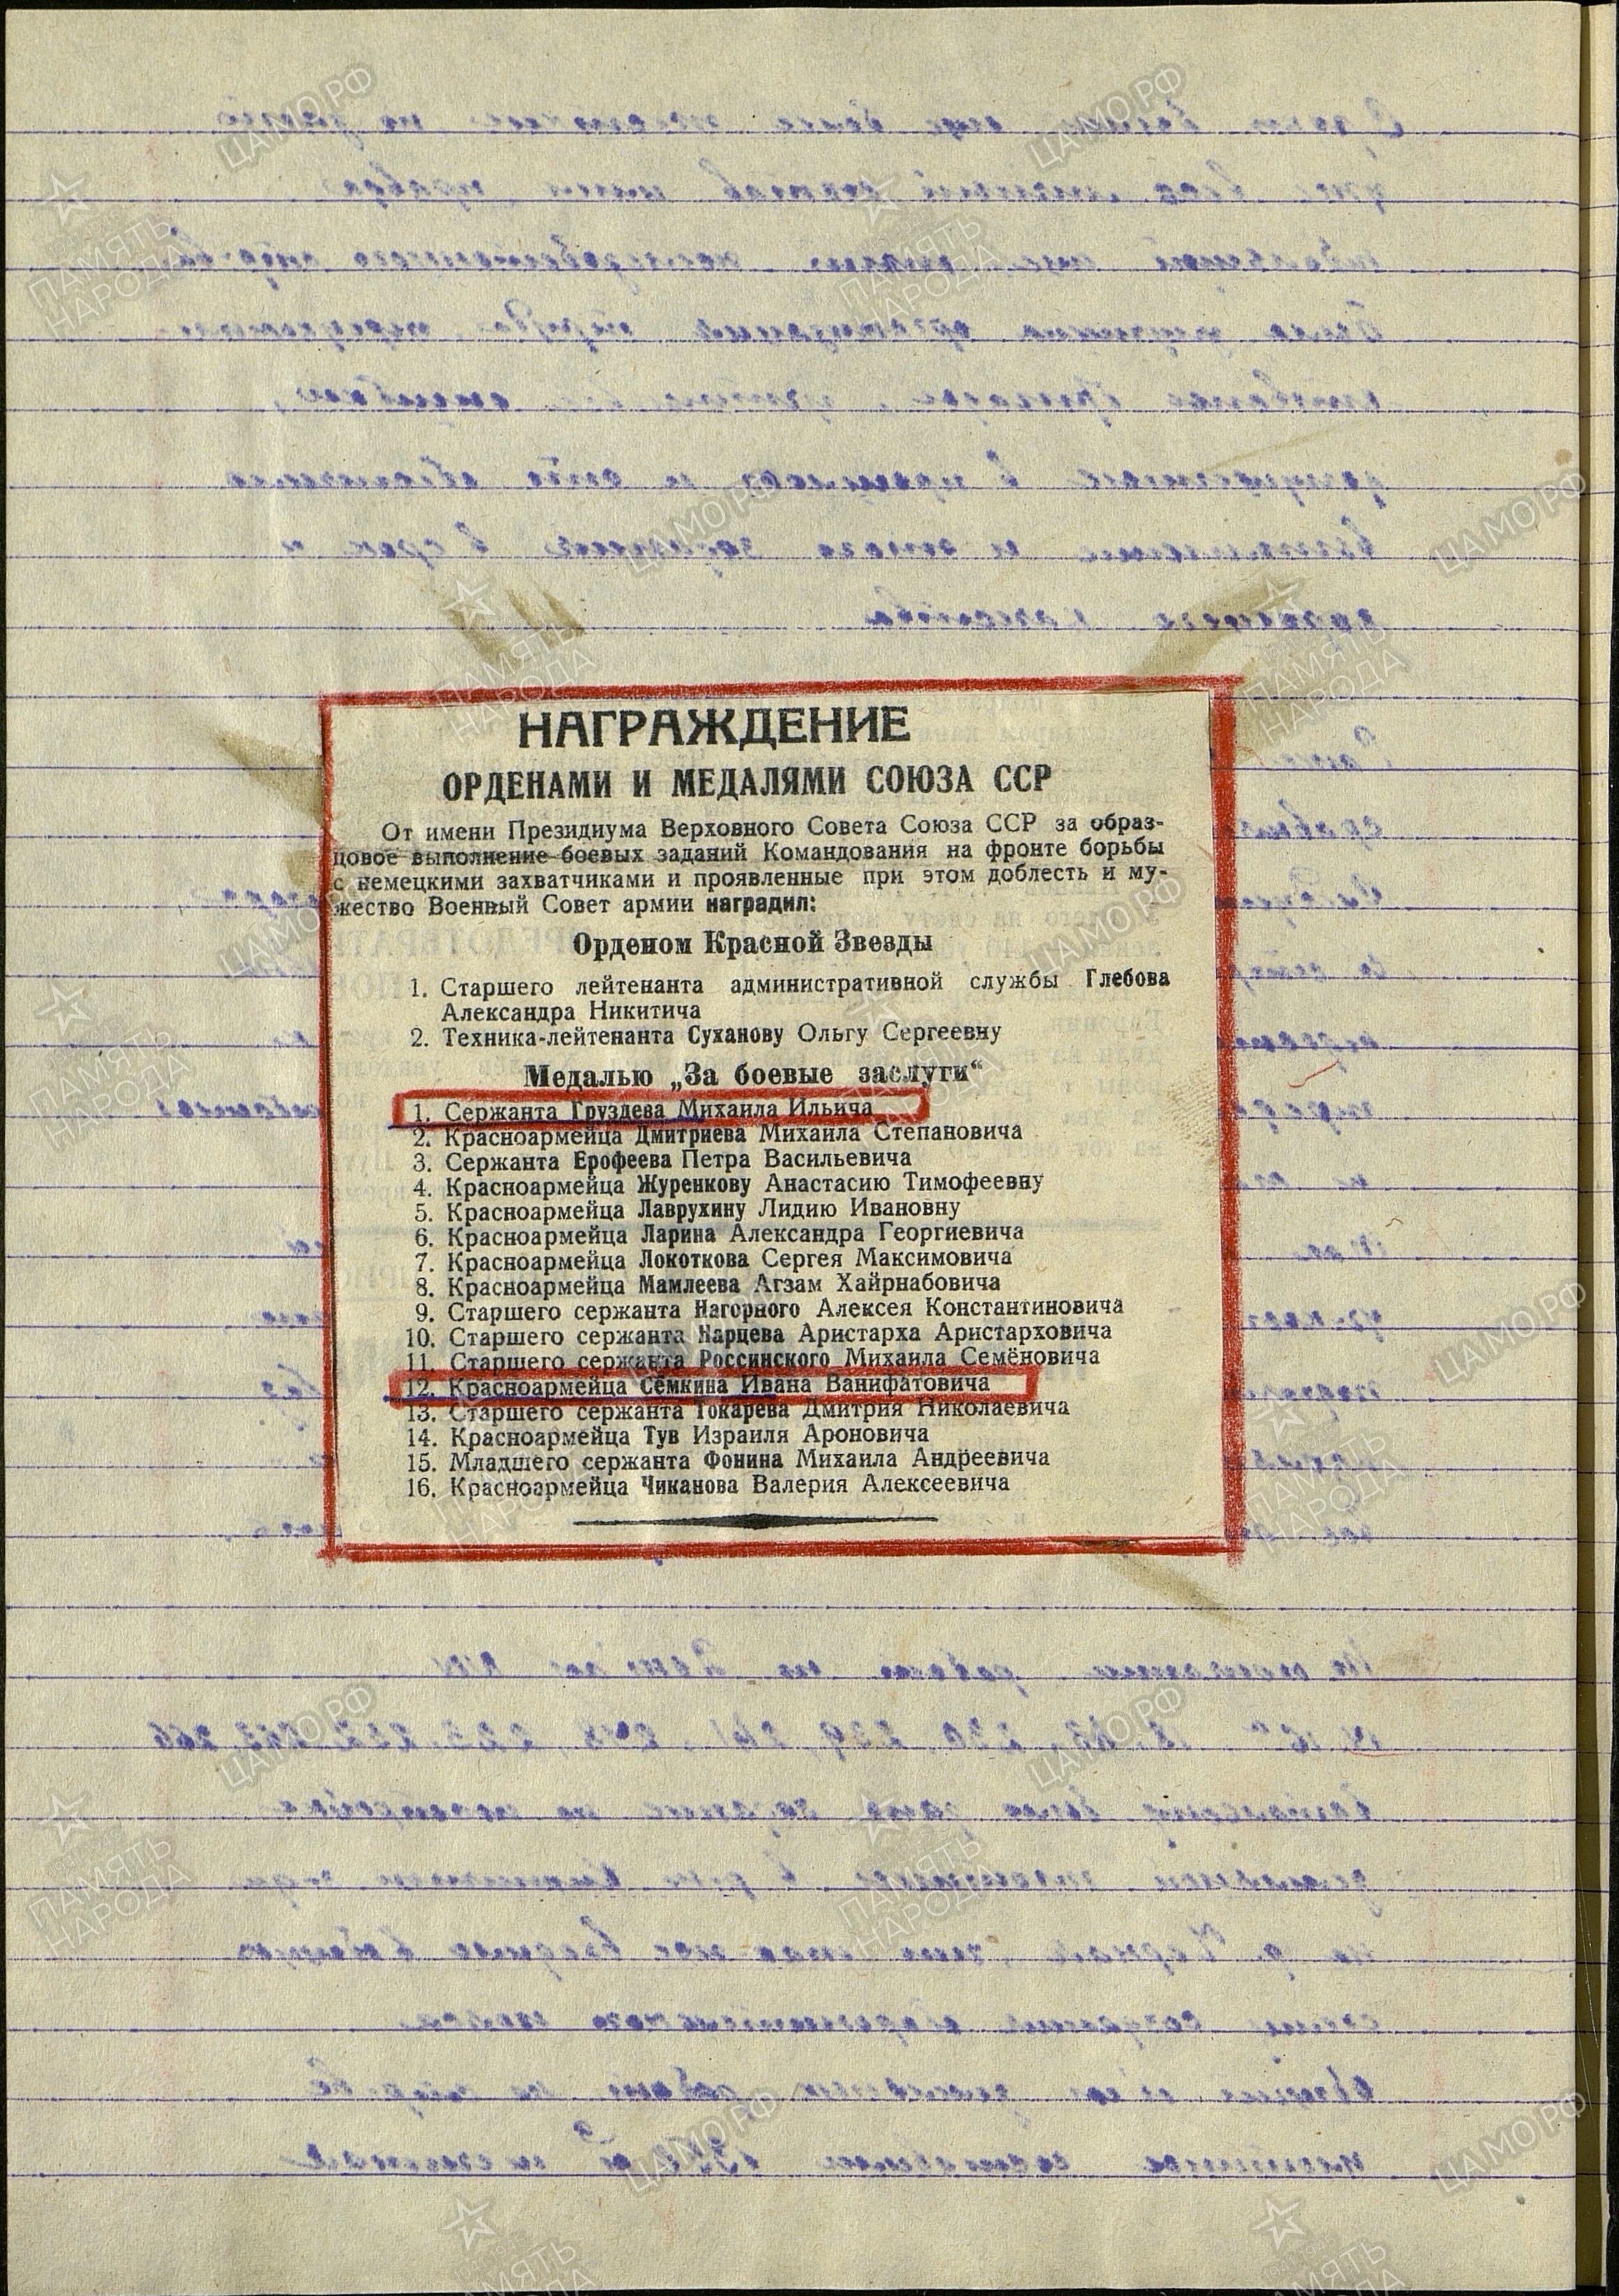 приказ схема укладки боеприпасов